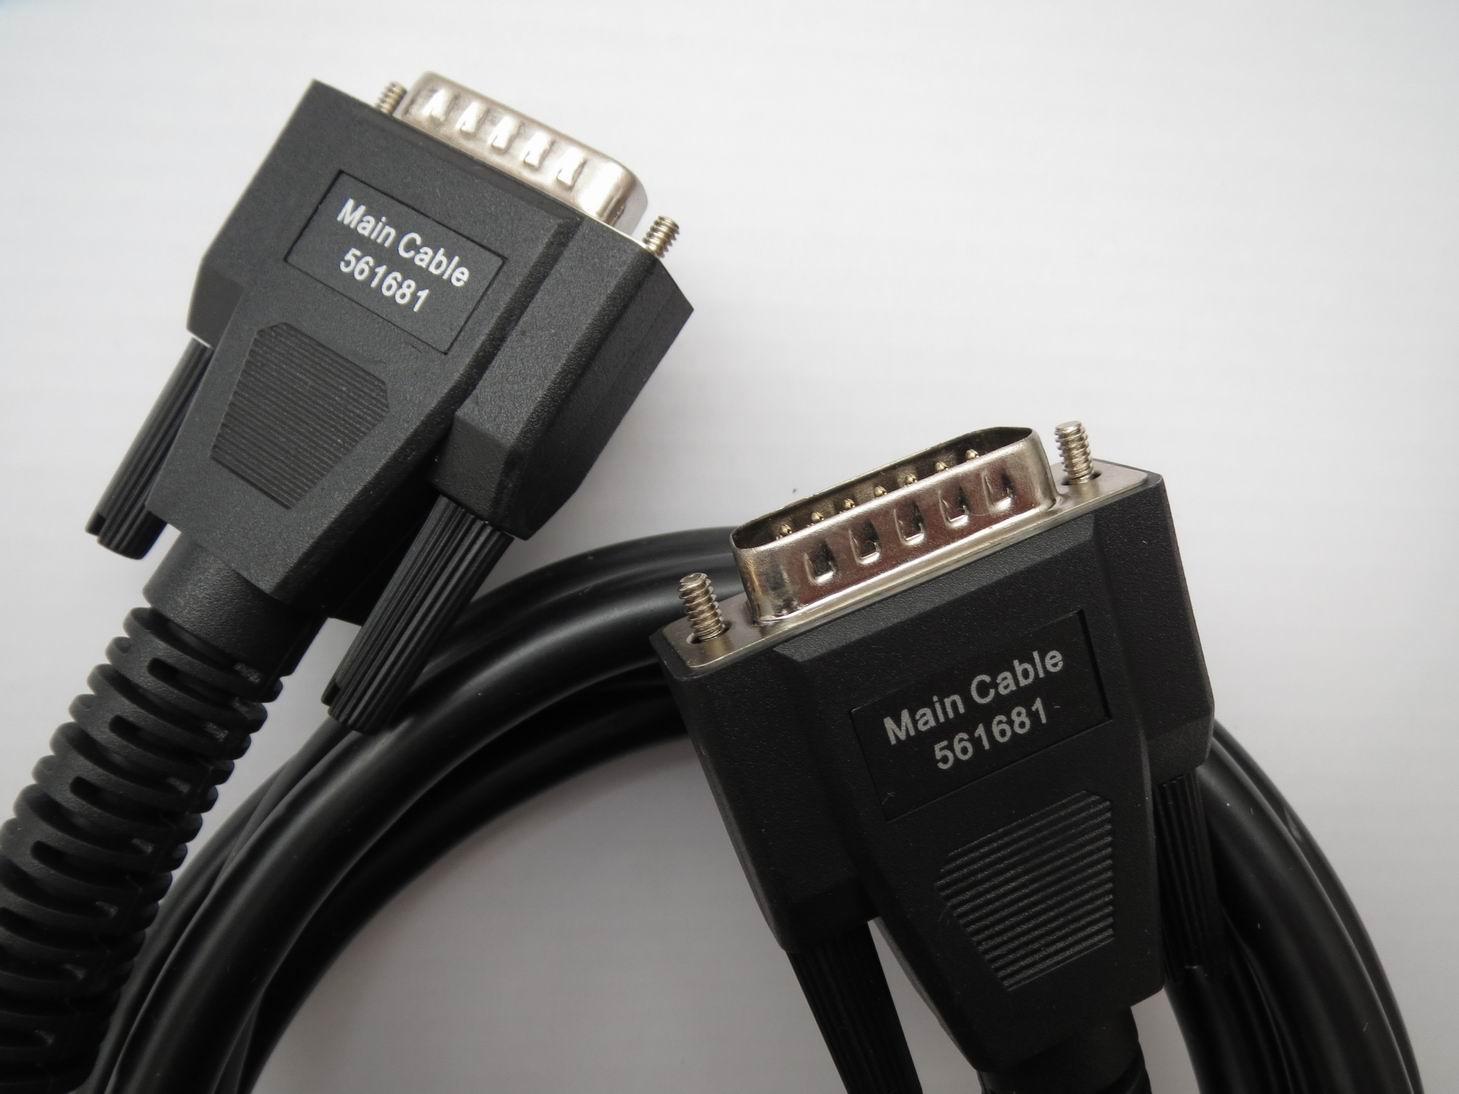 100% Original V30 DK80 2600+ 2700 2800 Main Cable for AutoBoss V30 Test Cables OBD-II Auto Scanner OBD2 Cable Obd 2 561681